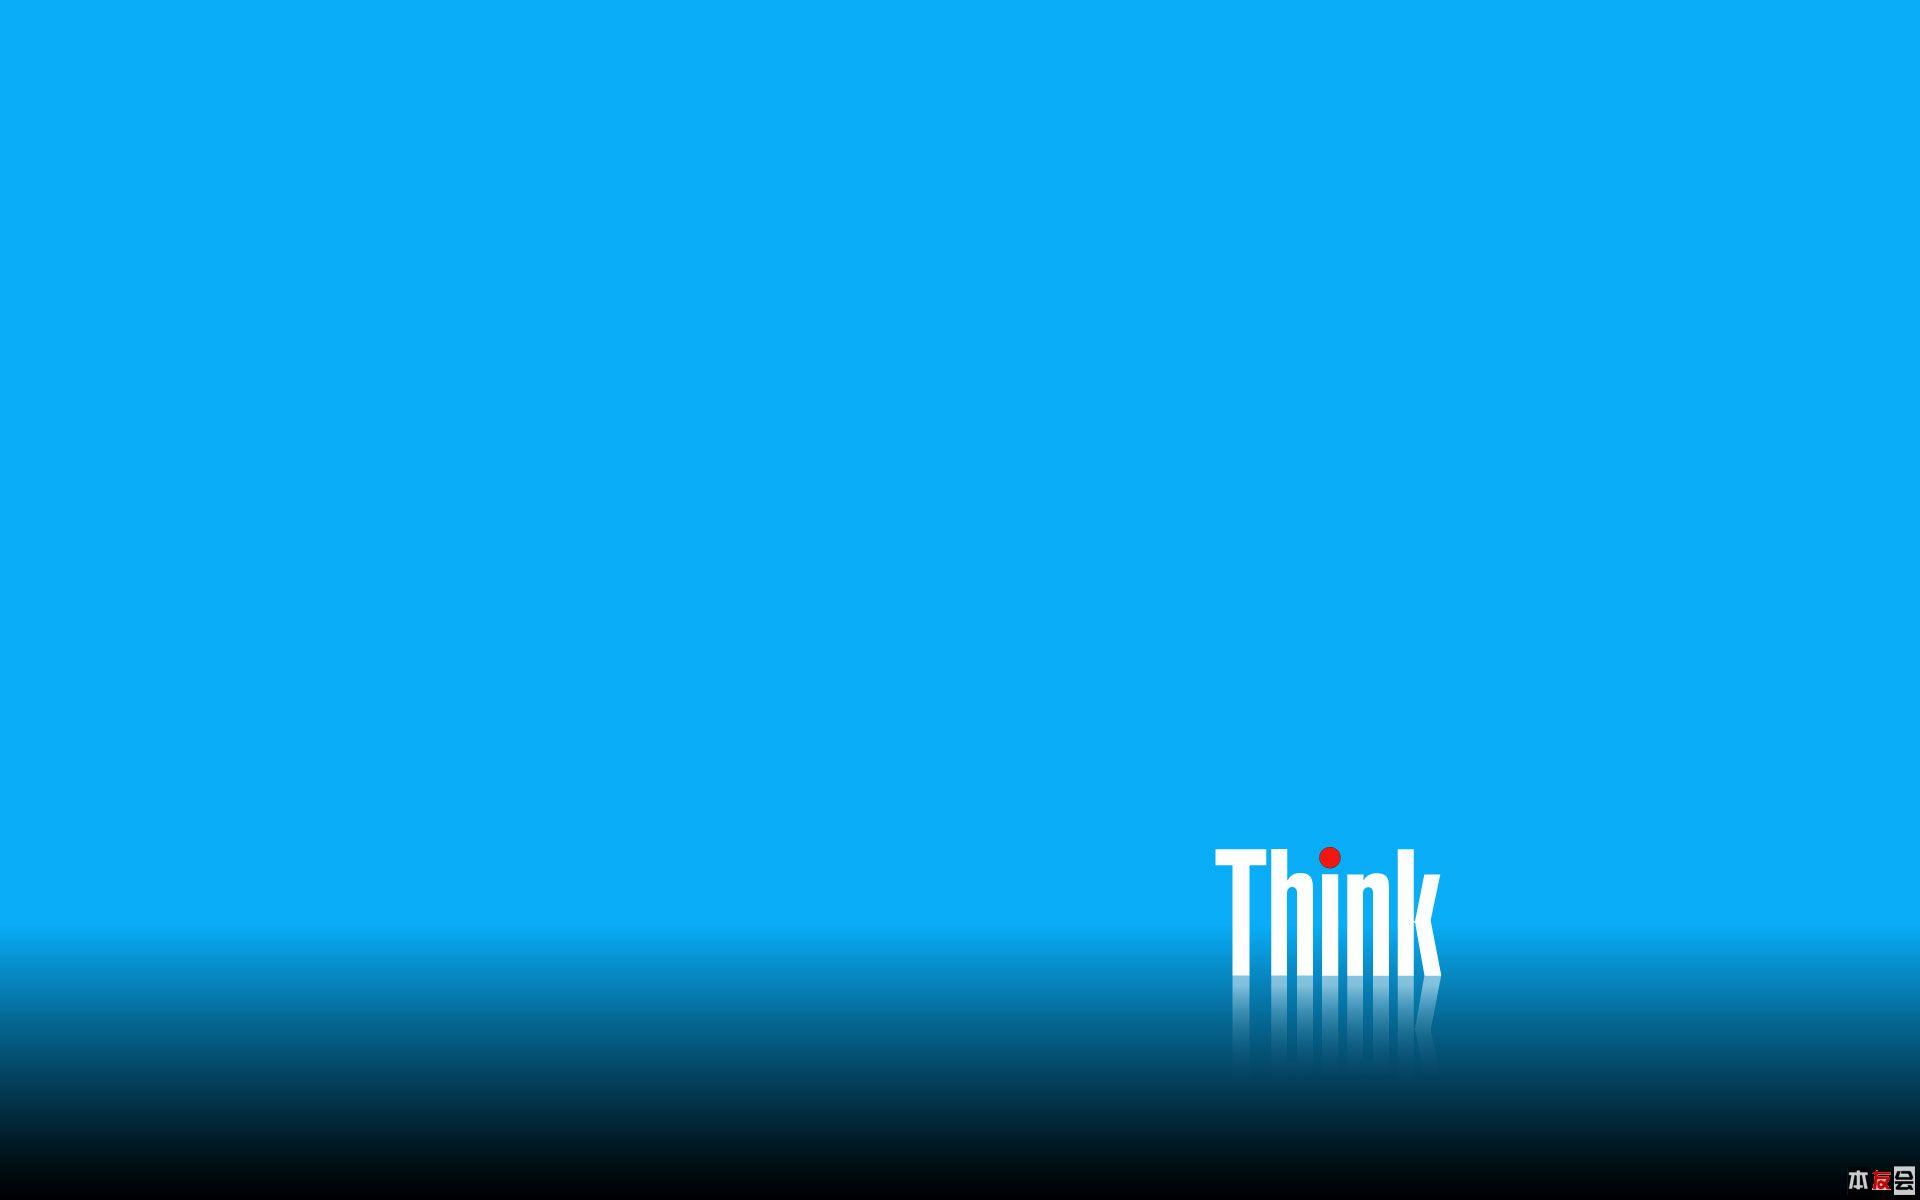 Think_Blue.jpg